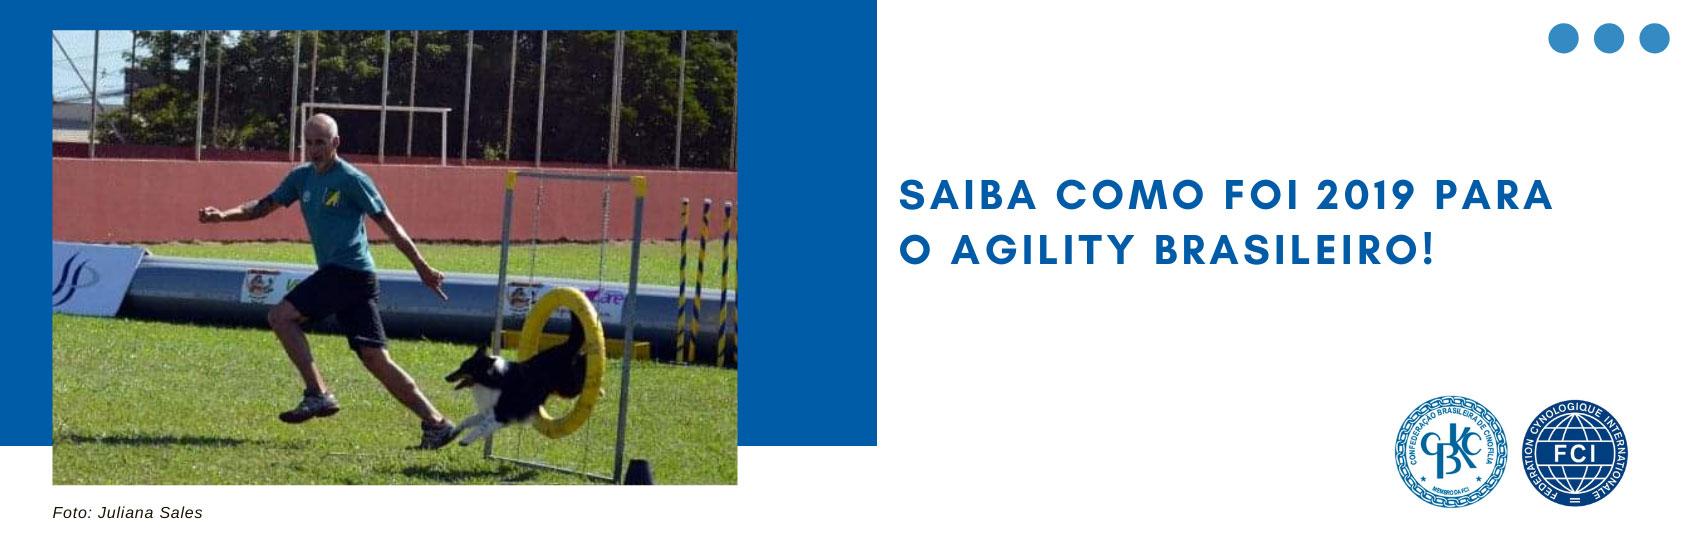 CBKC - Agility no Brasil em 2019.